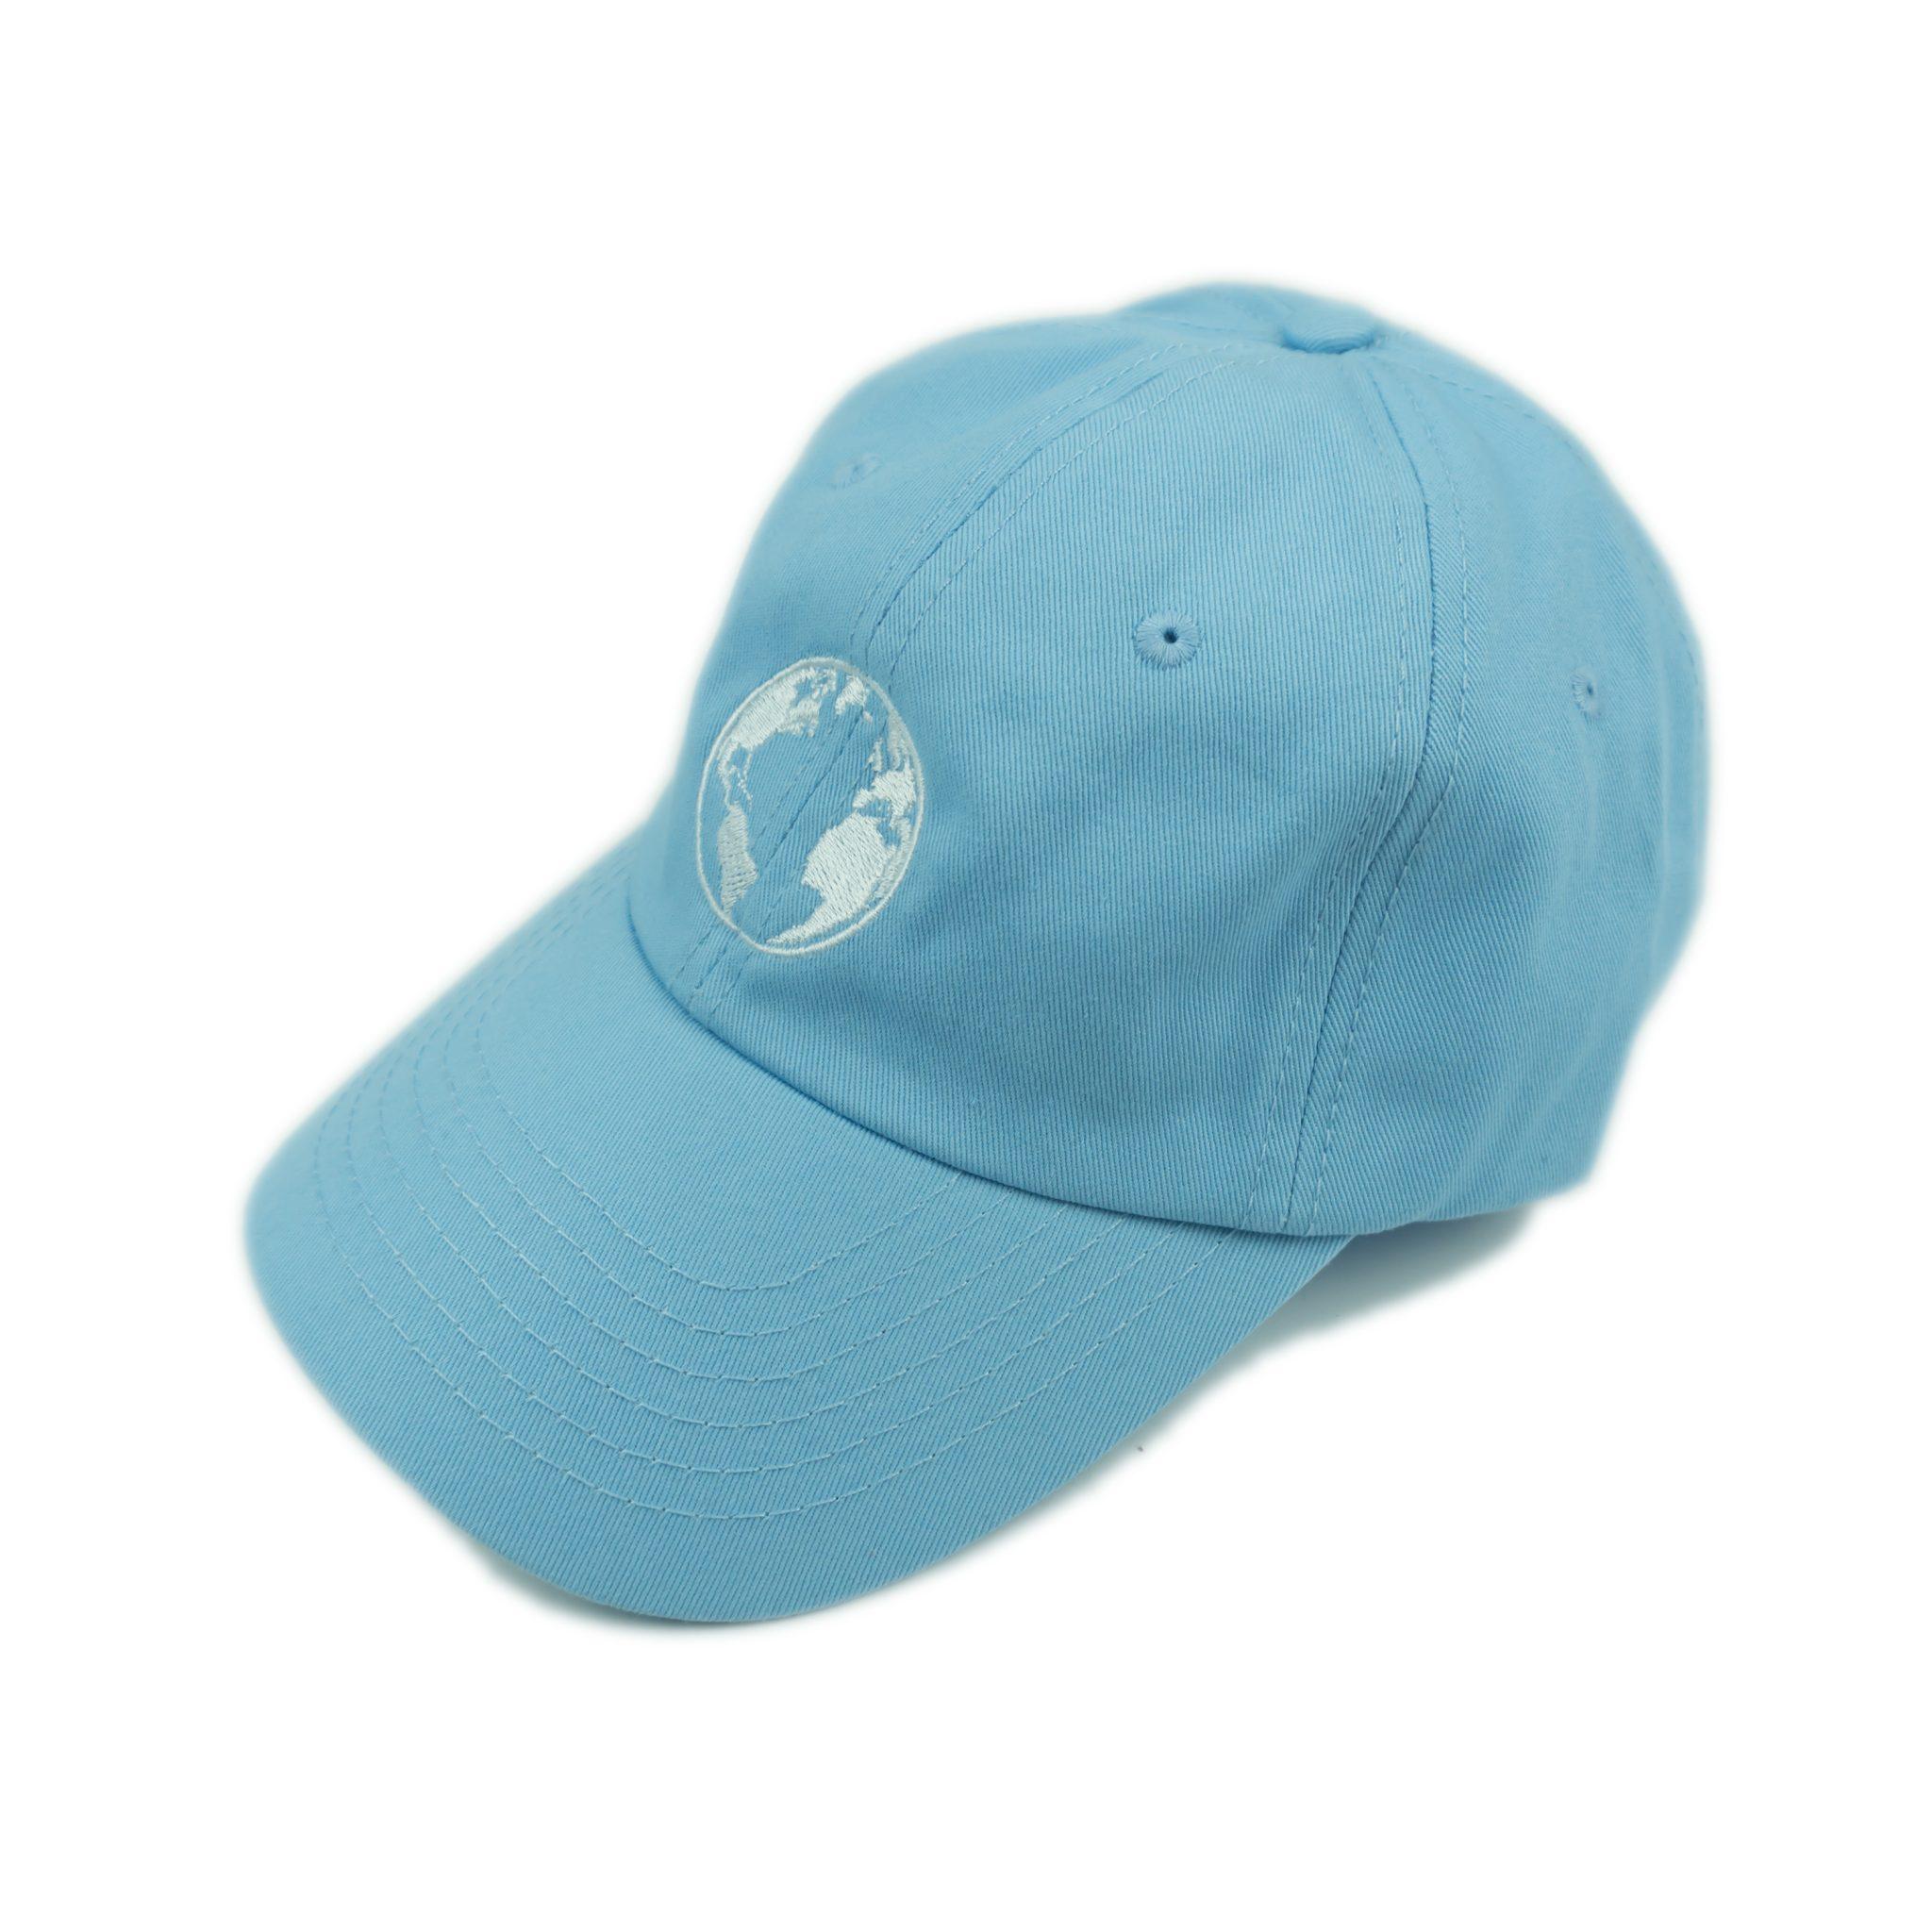 848bcc7f3d1 Pastel Pink Baseball Hat - Parchment N Lead